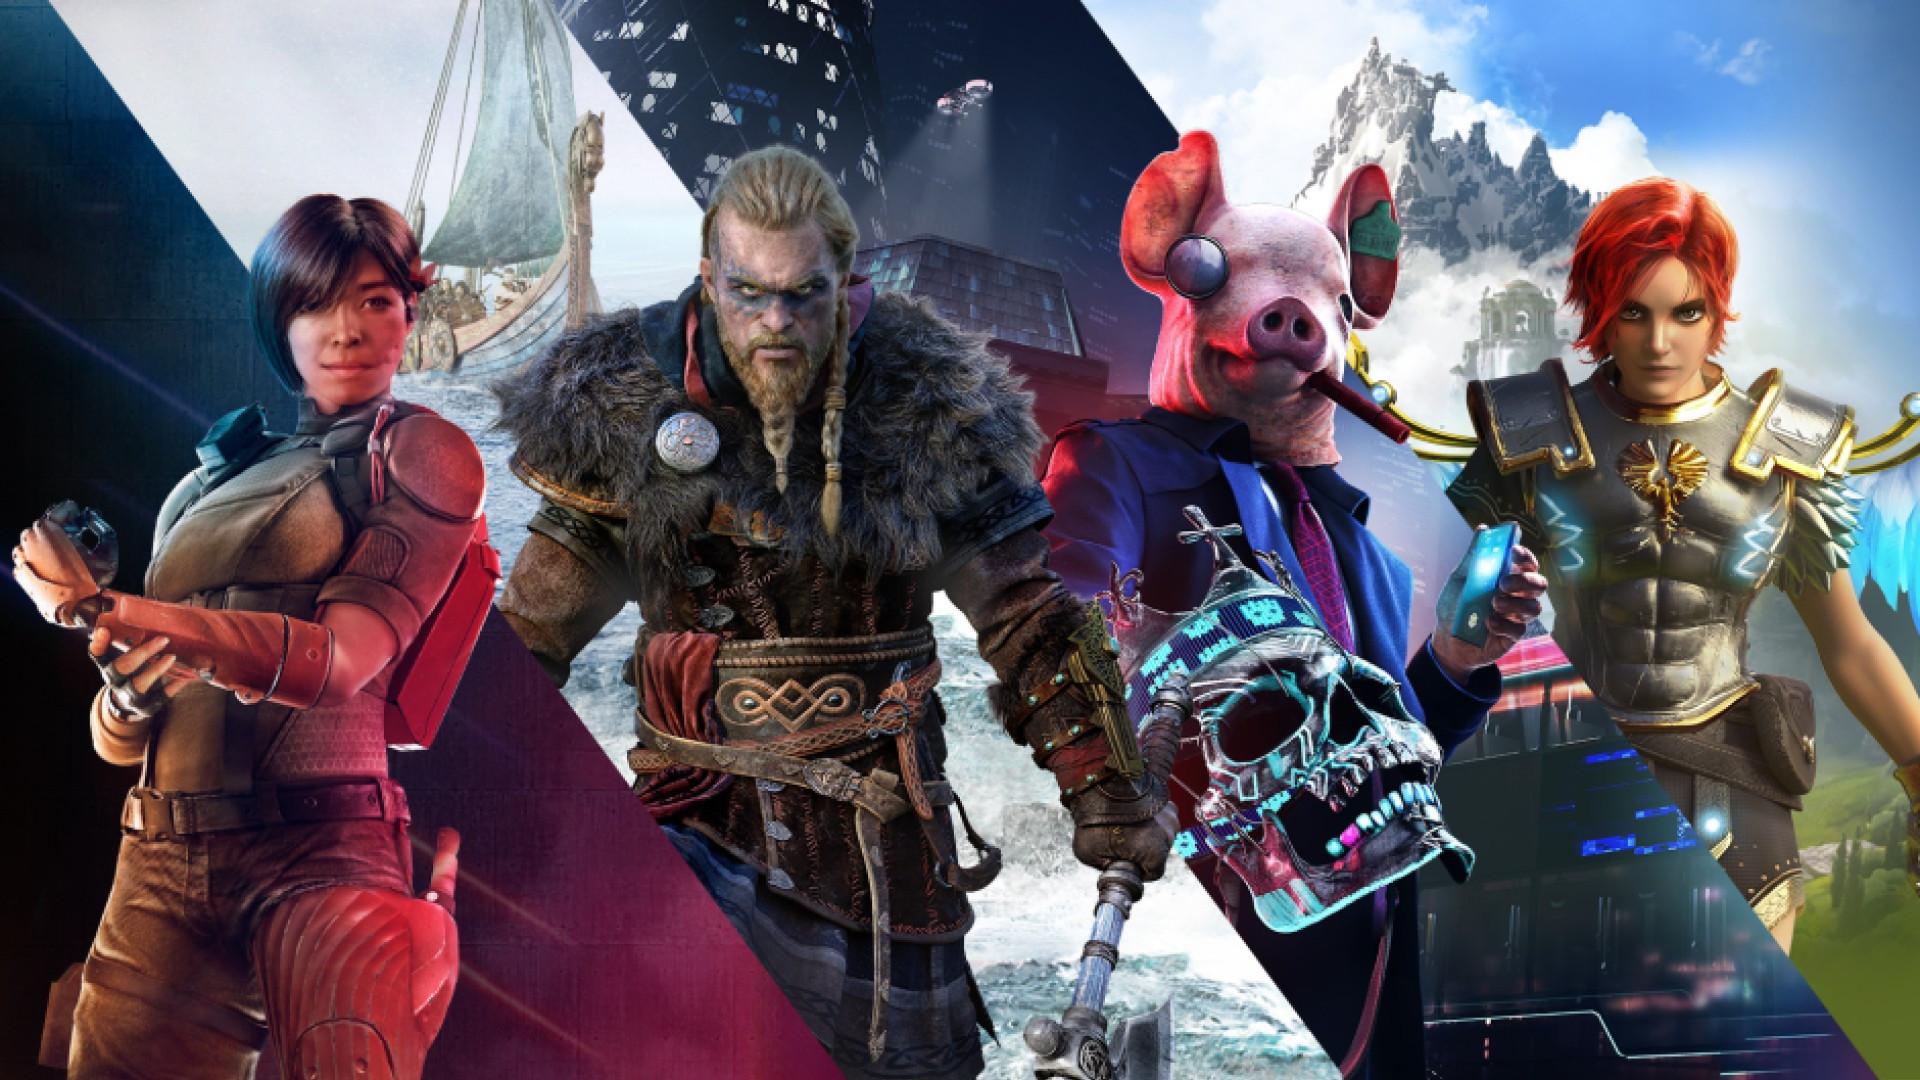 Sale to Ubisoft publishers